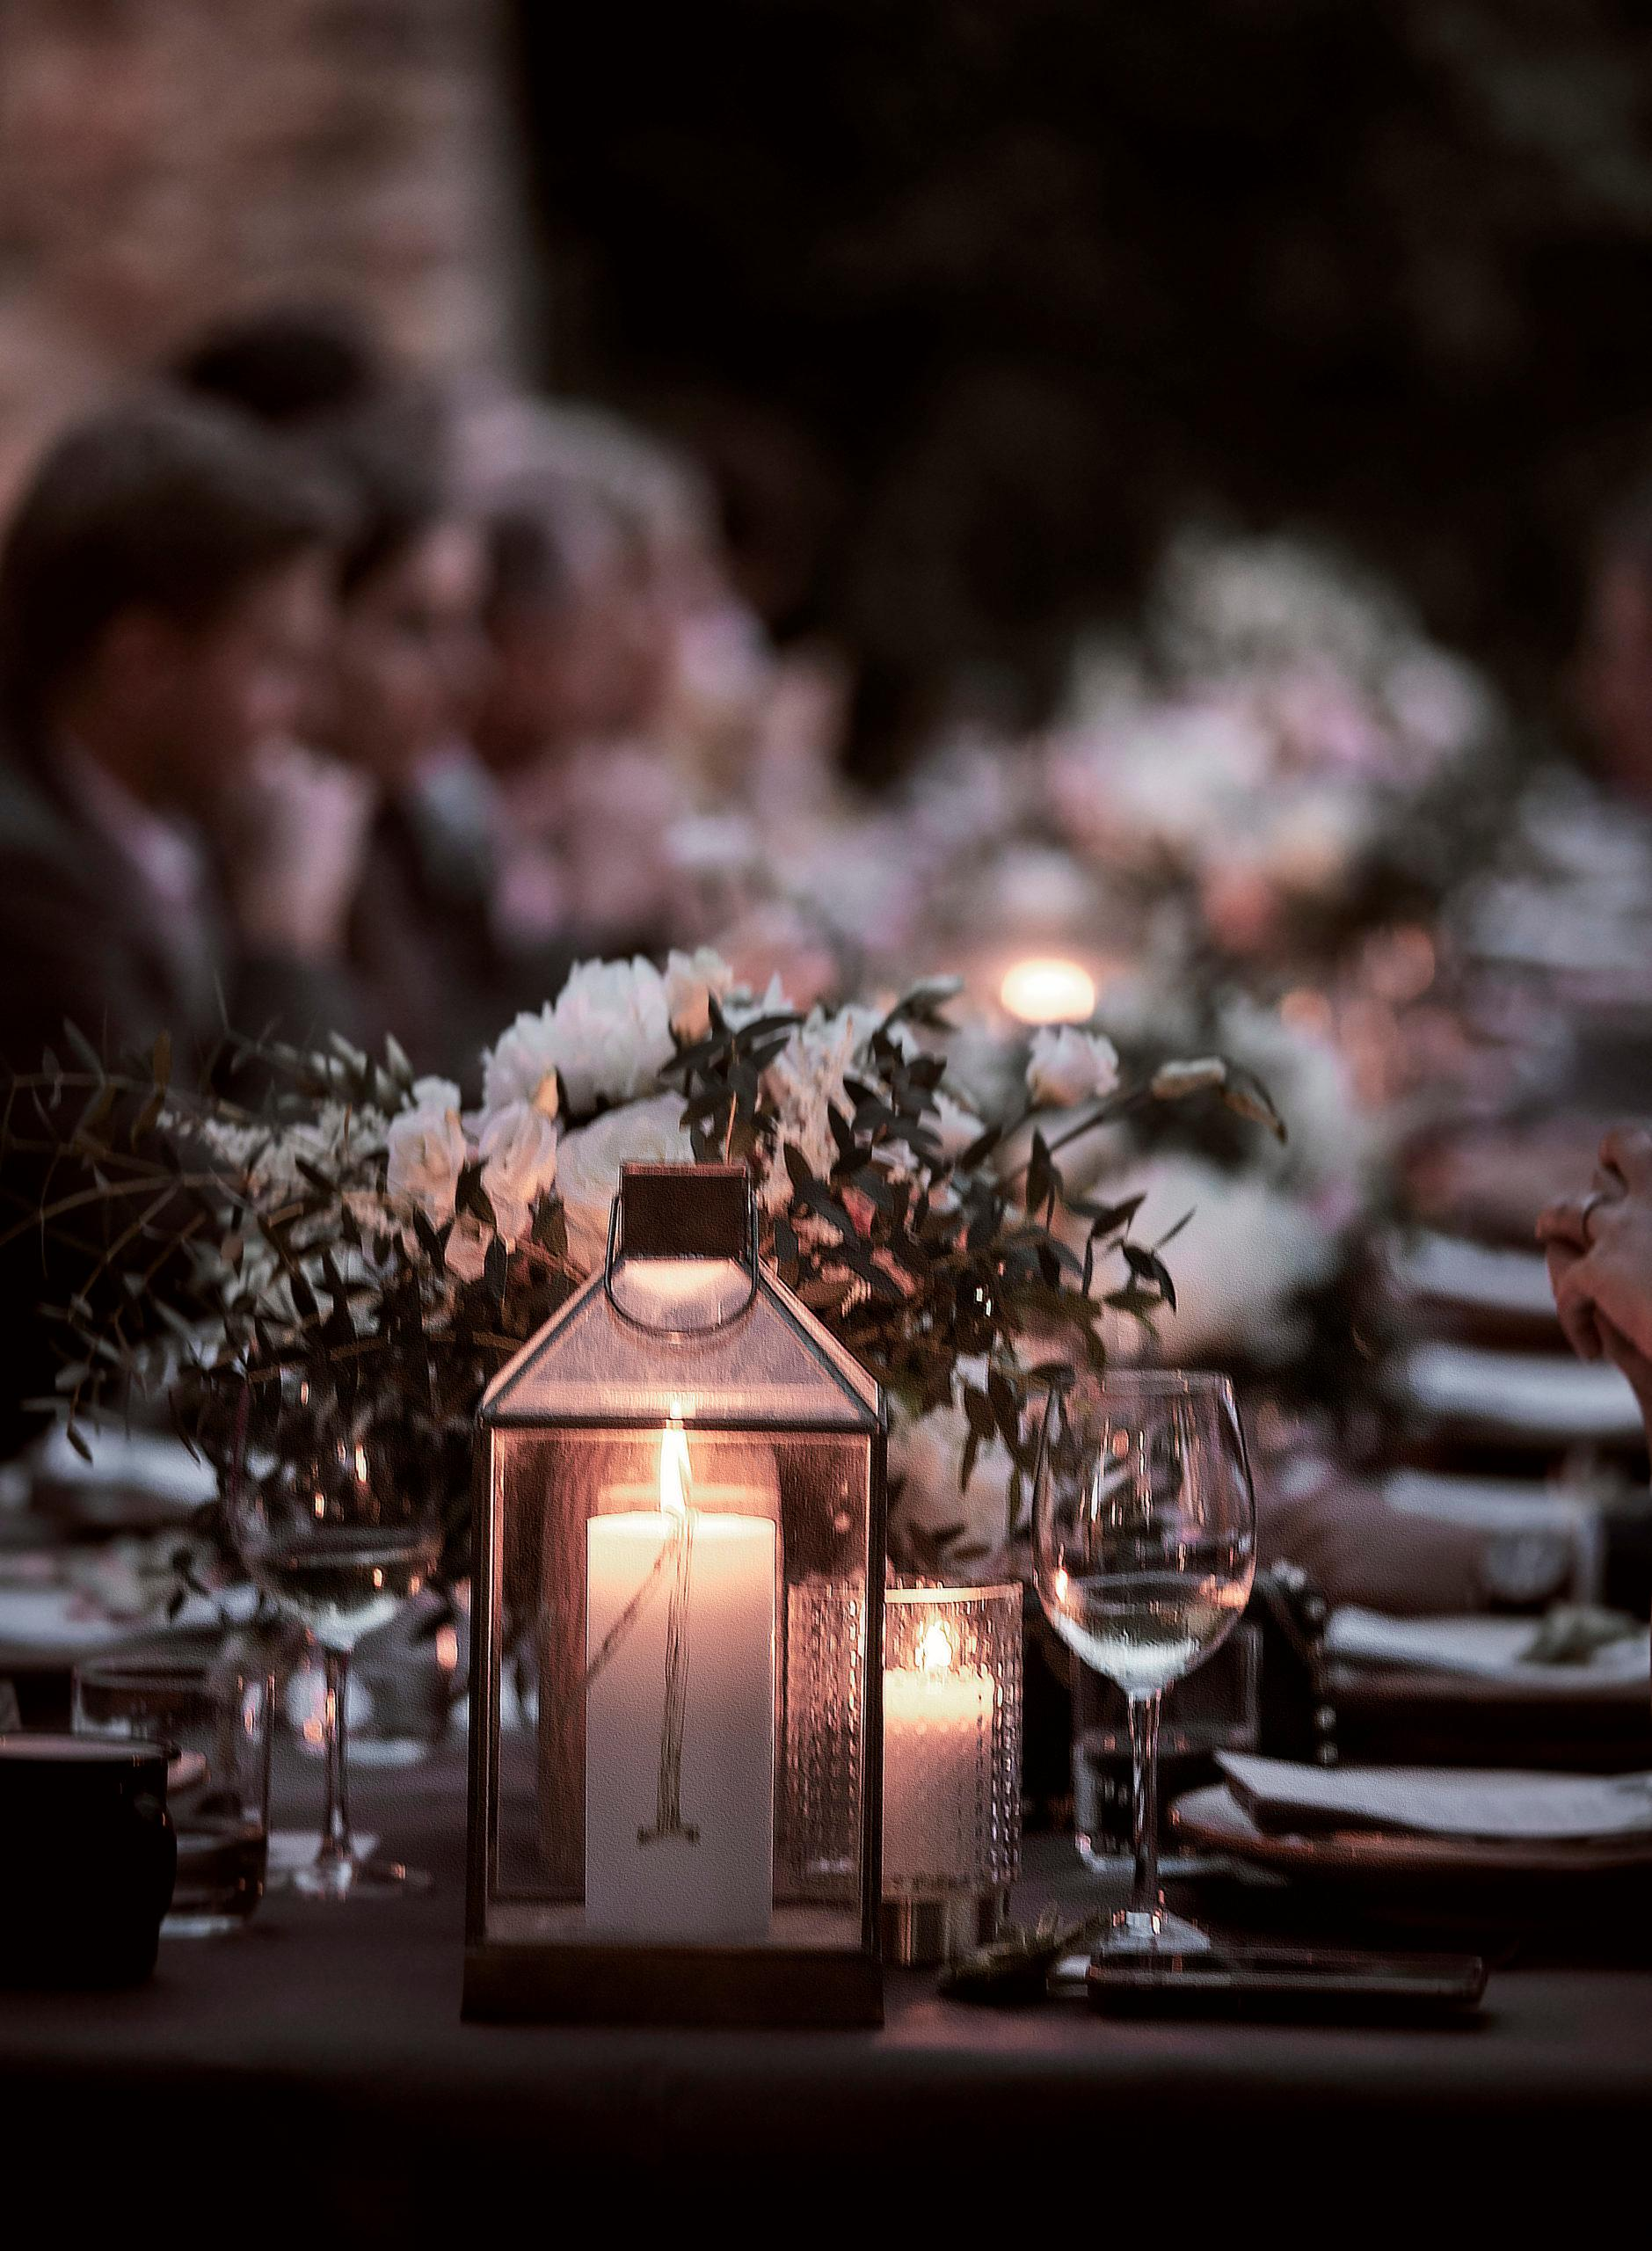 Gedekte tafel met windlicht en gasten